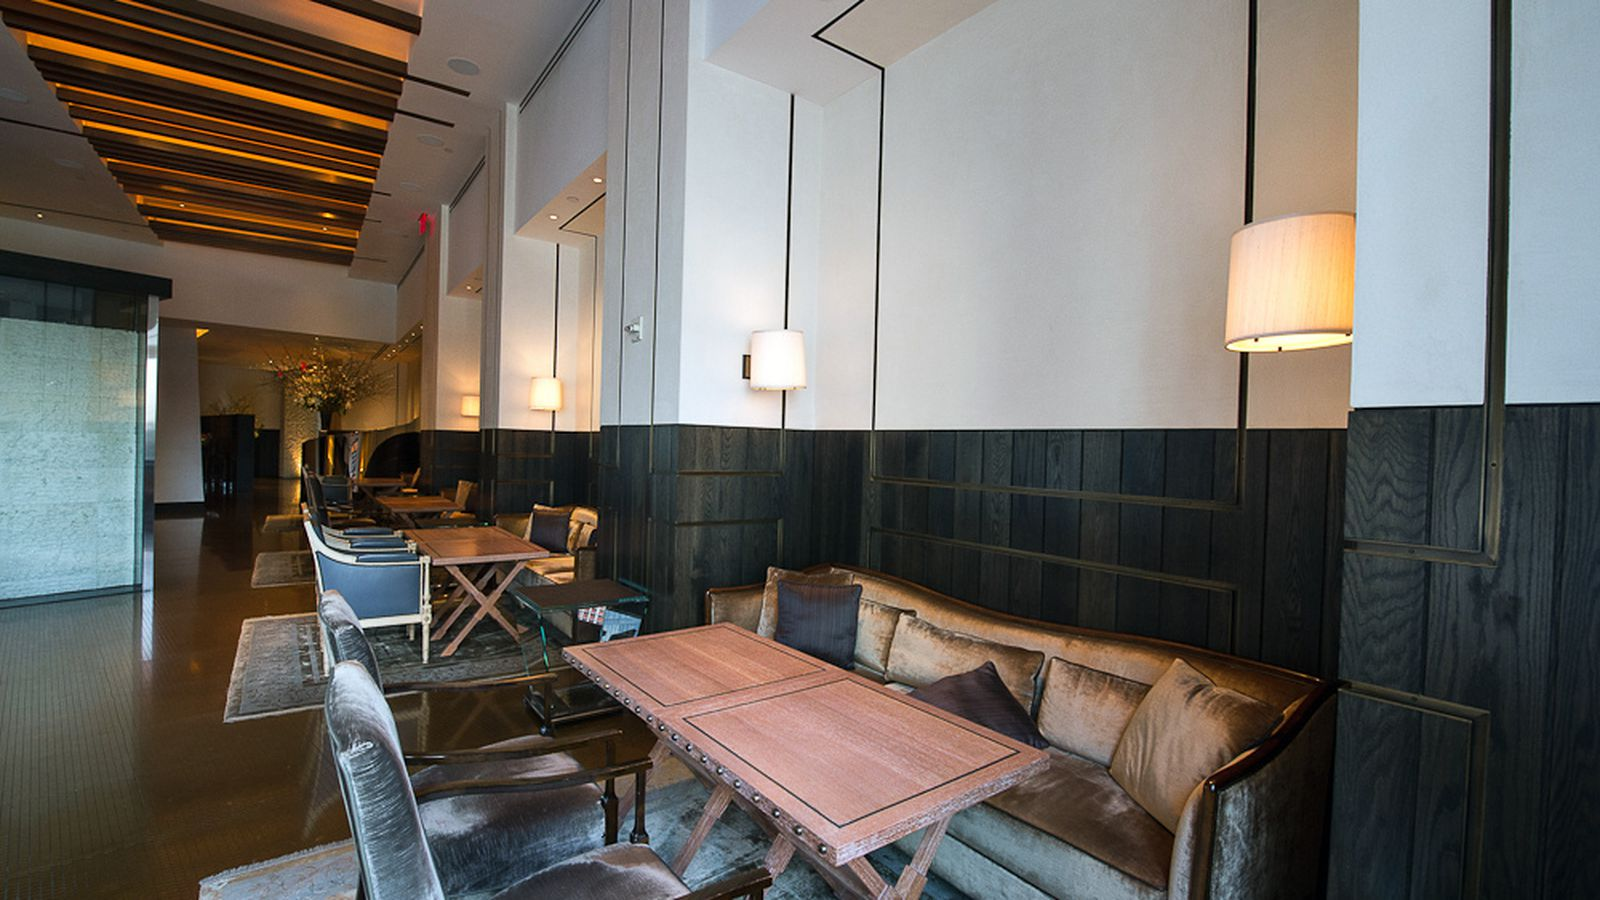 per se introduces 65 5 course dessert menu in salon. Black Bedroom Furniture Sets. Home Design Ideas